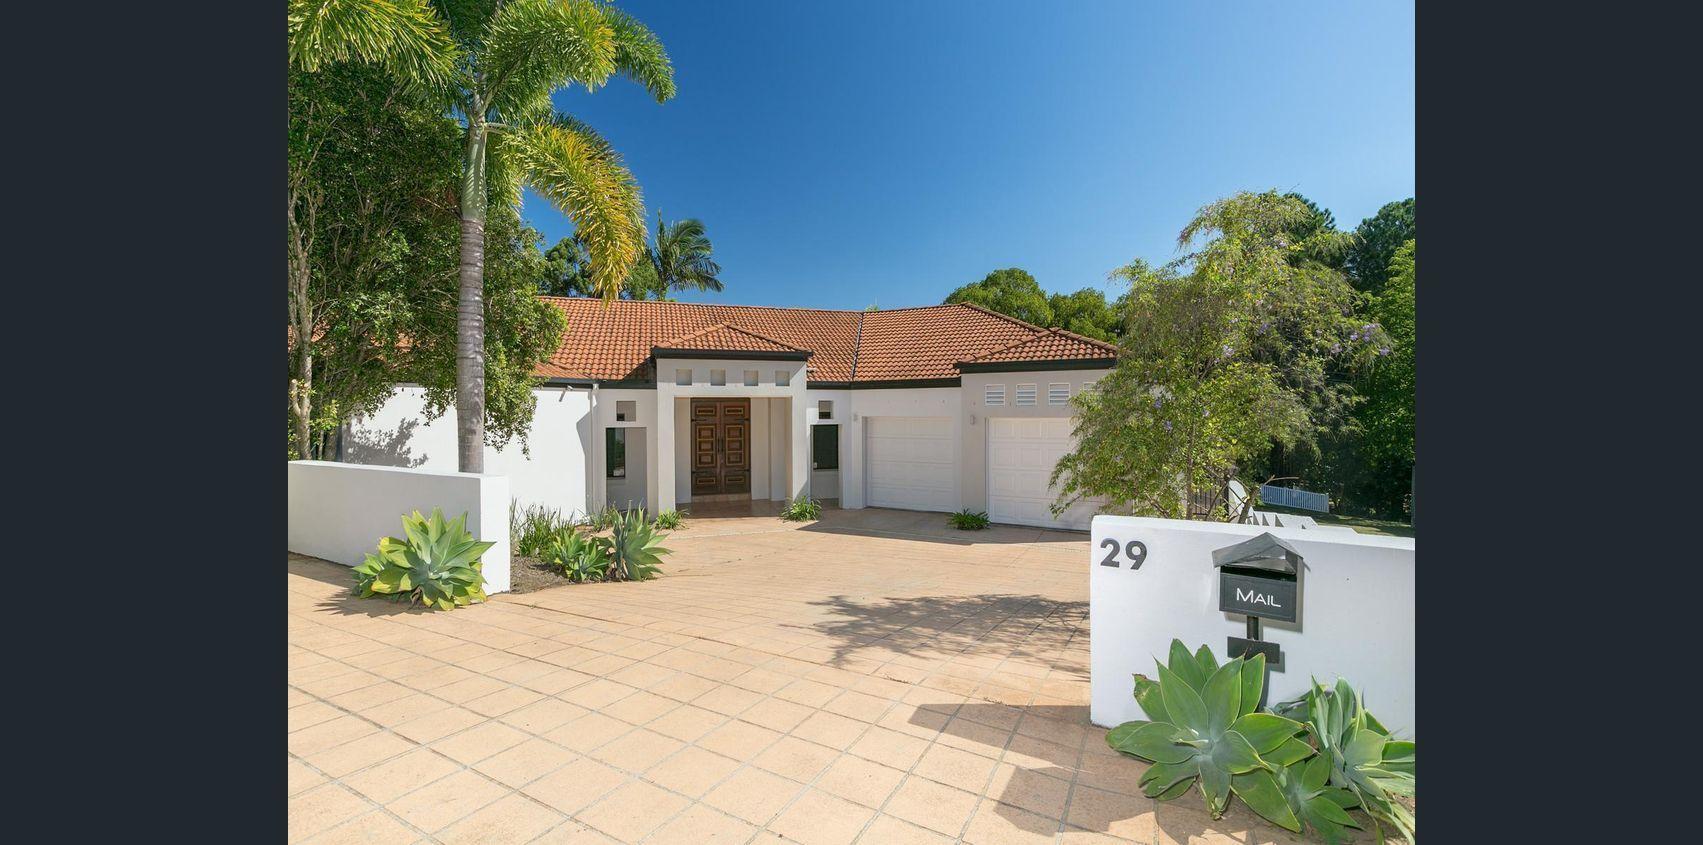 29 Courcheval Terrace, Mons QLD 4556, Image 1